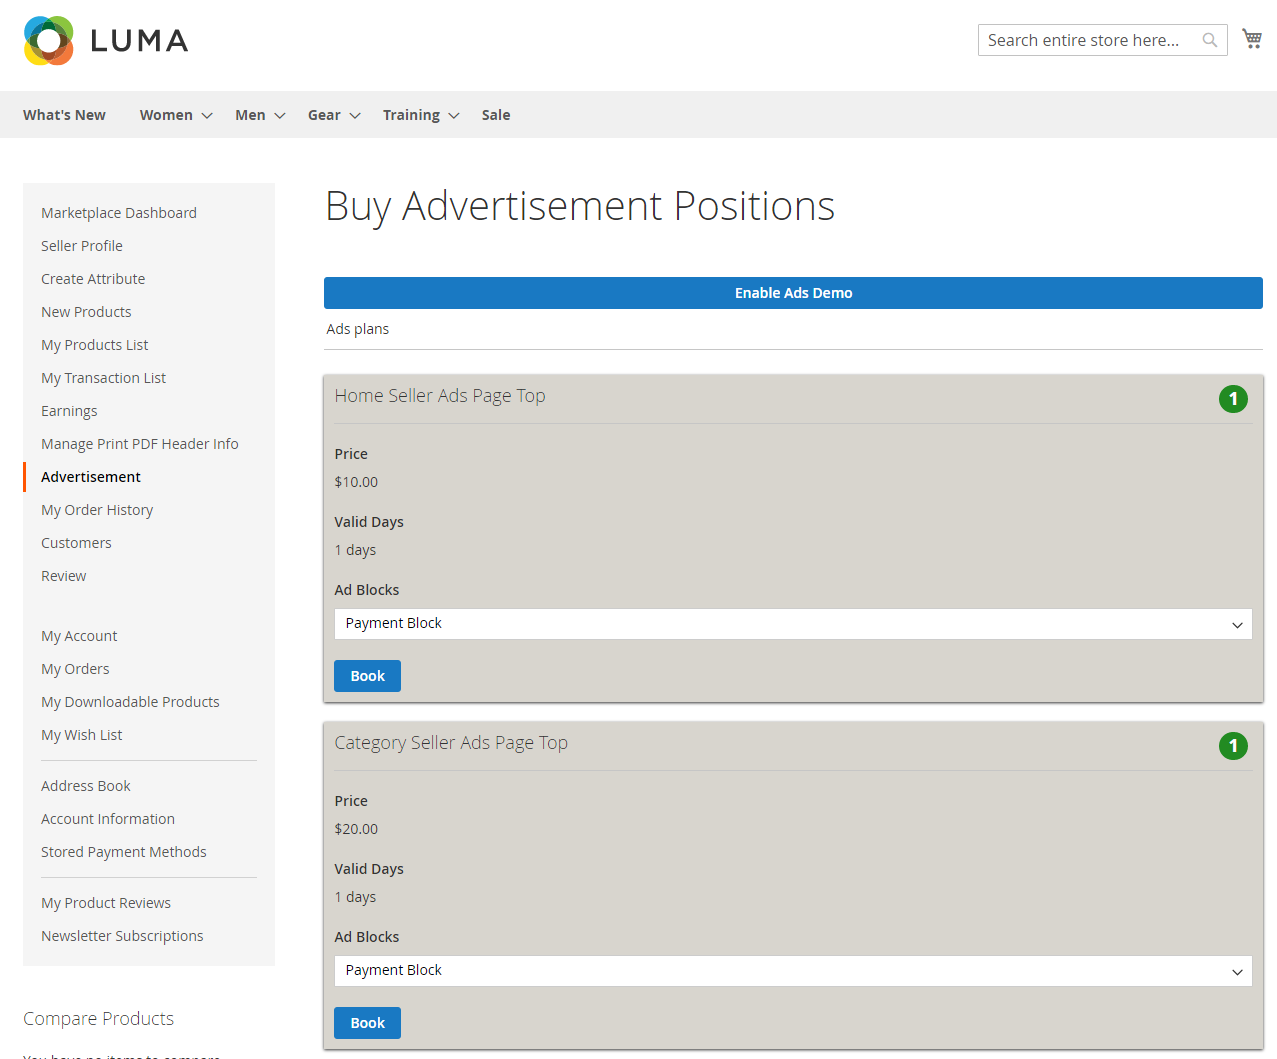 Buy-Advertisement-Positions-1